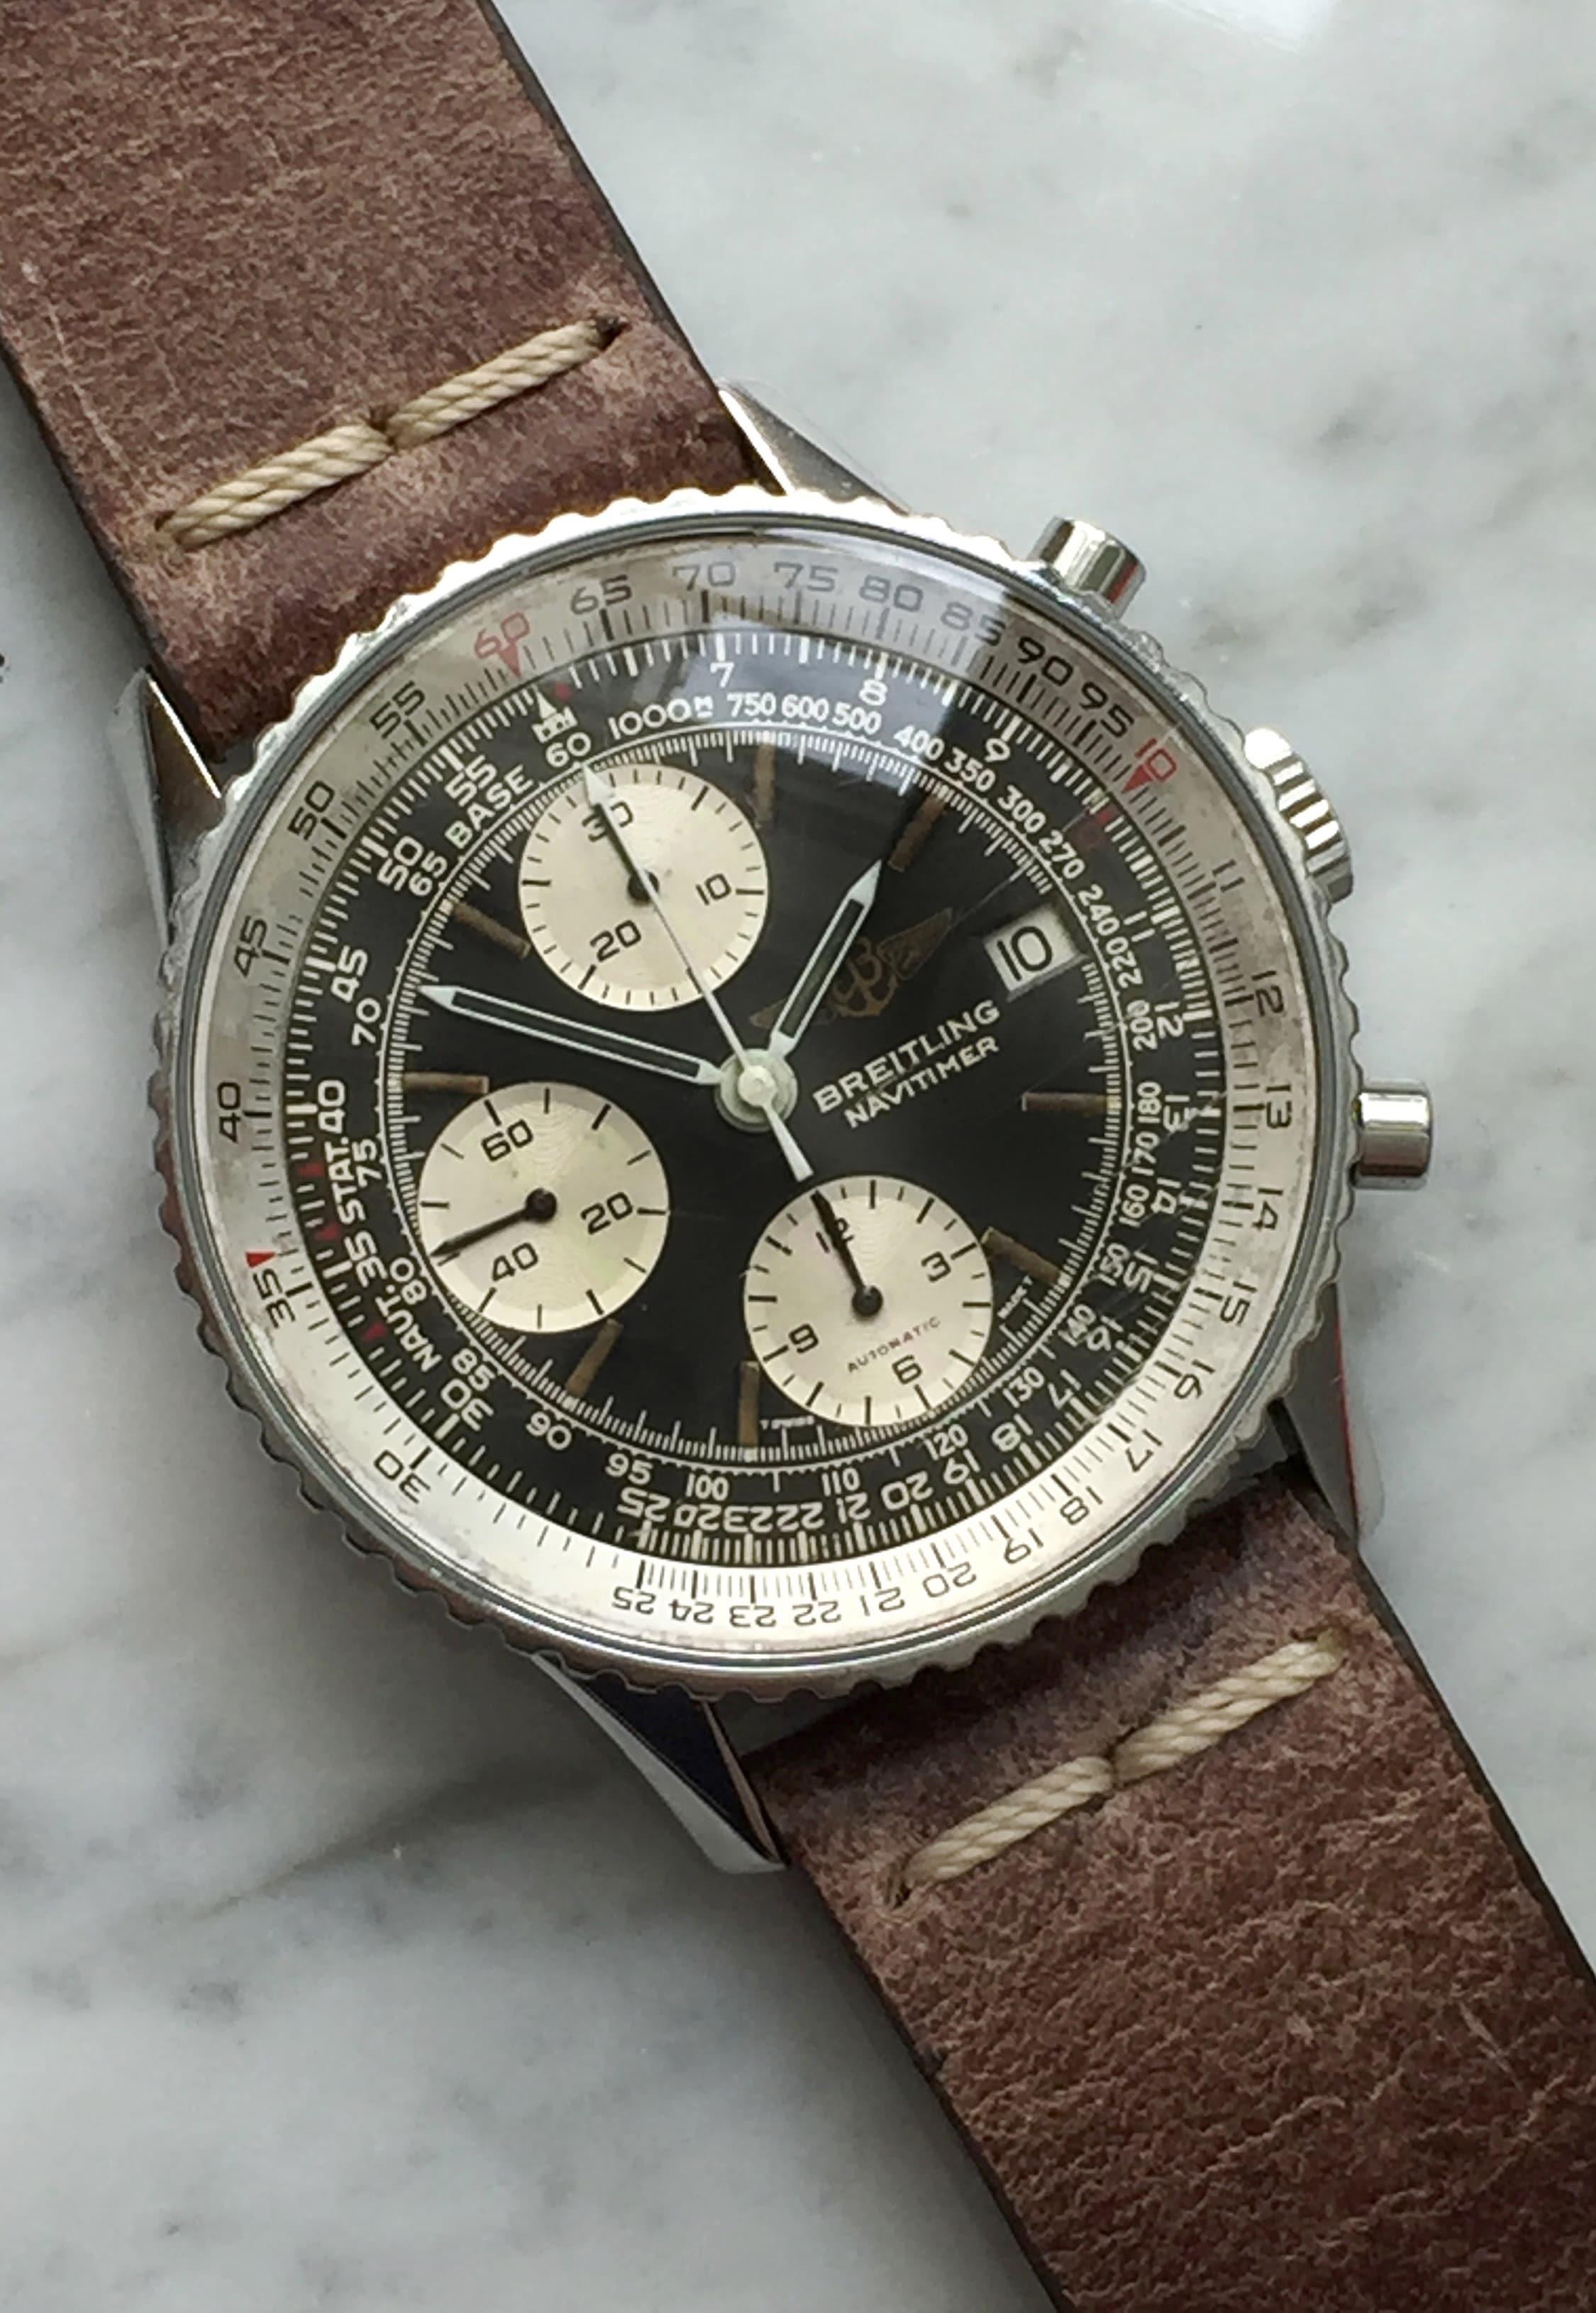 1992 Breitling Navitimer Vintage Chronograph